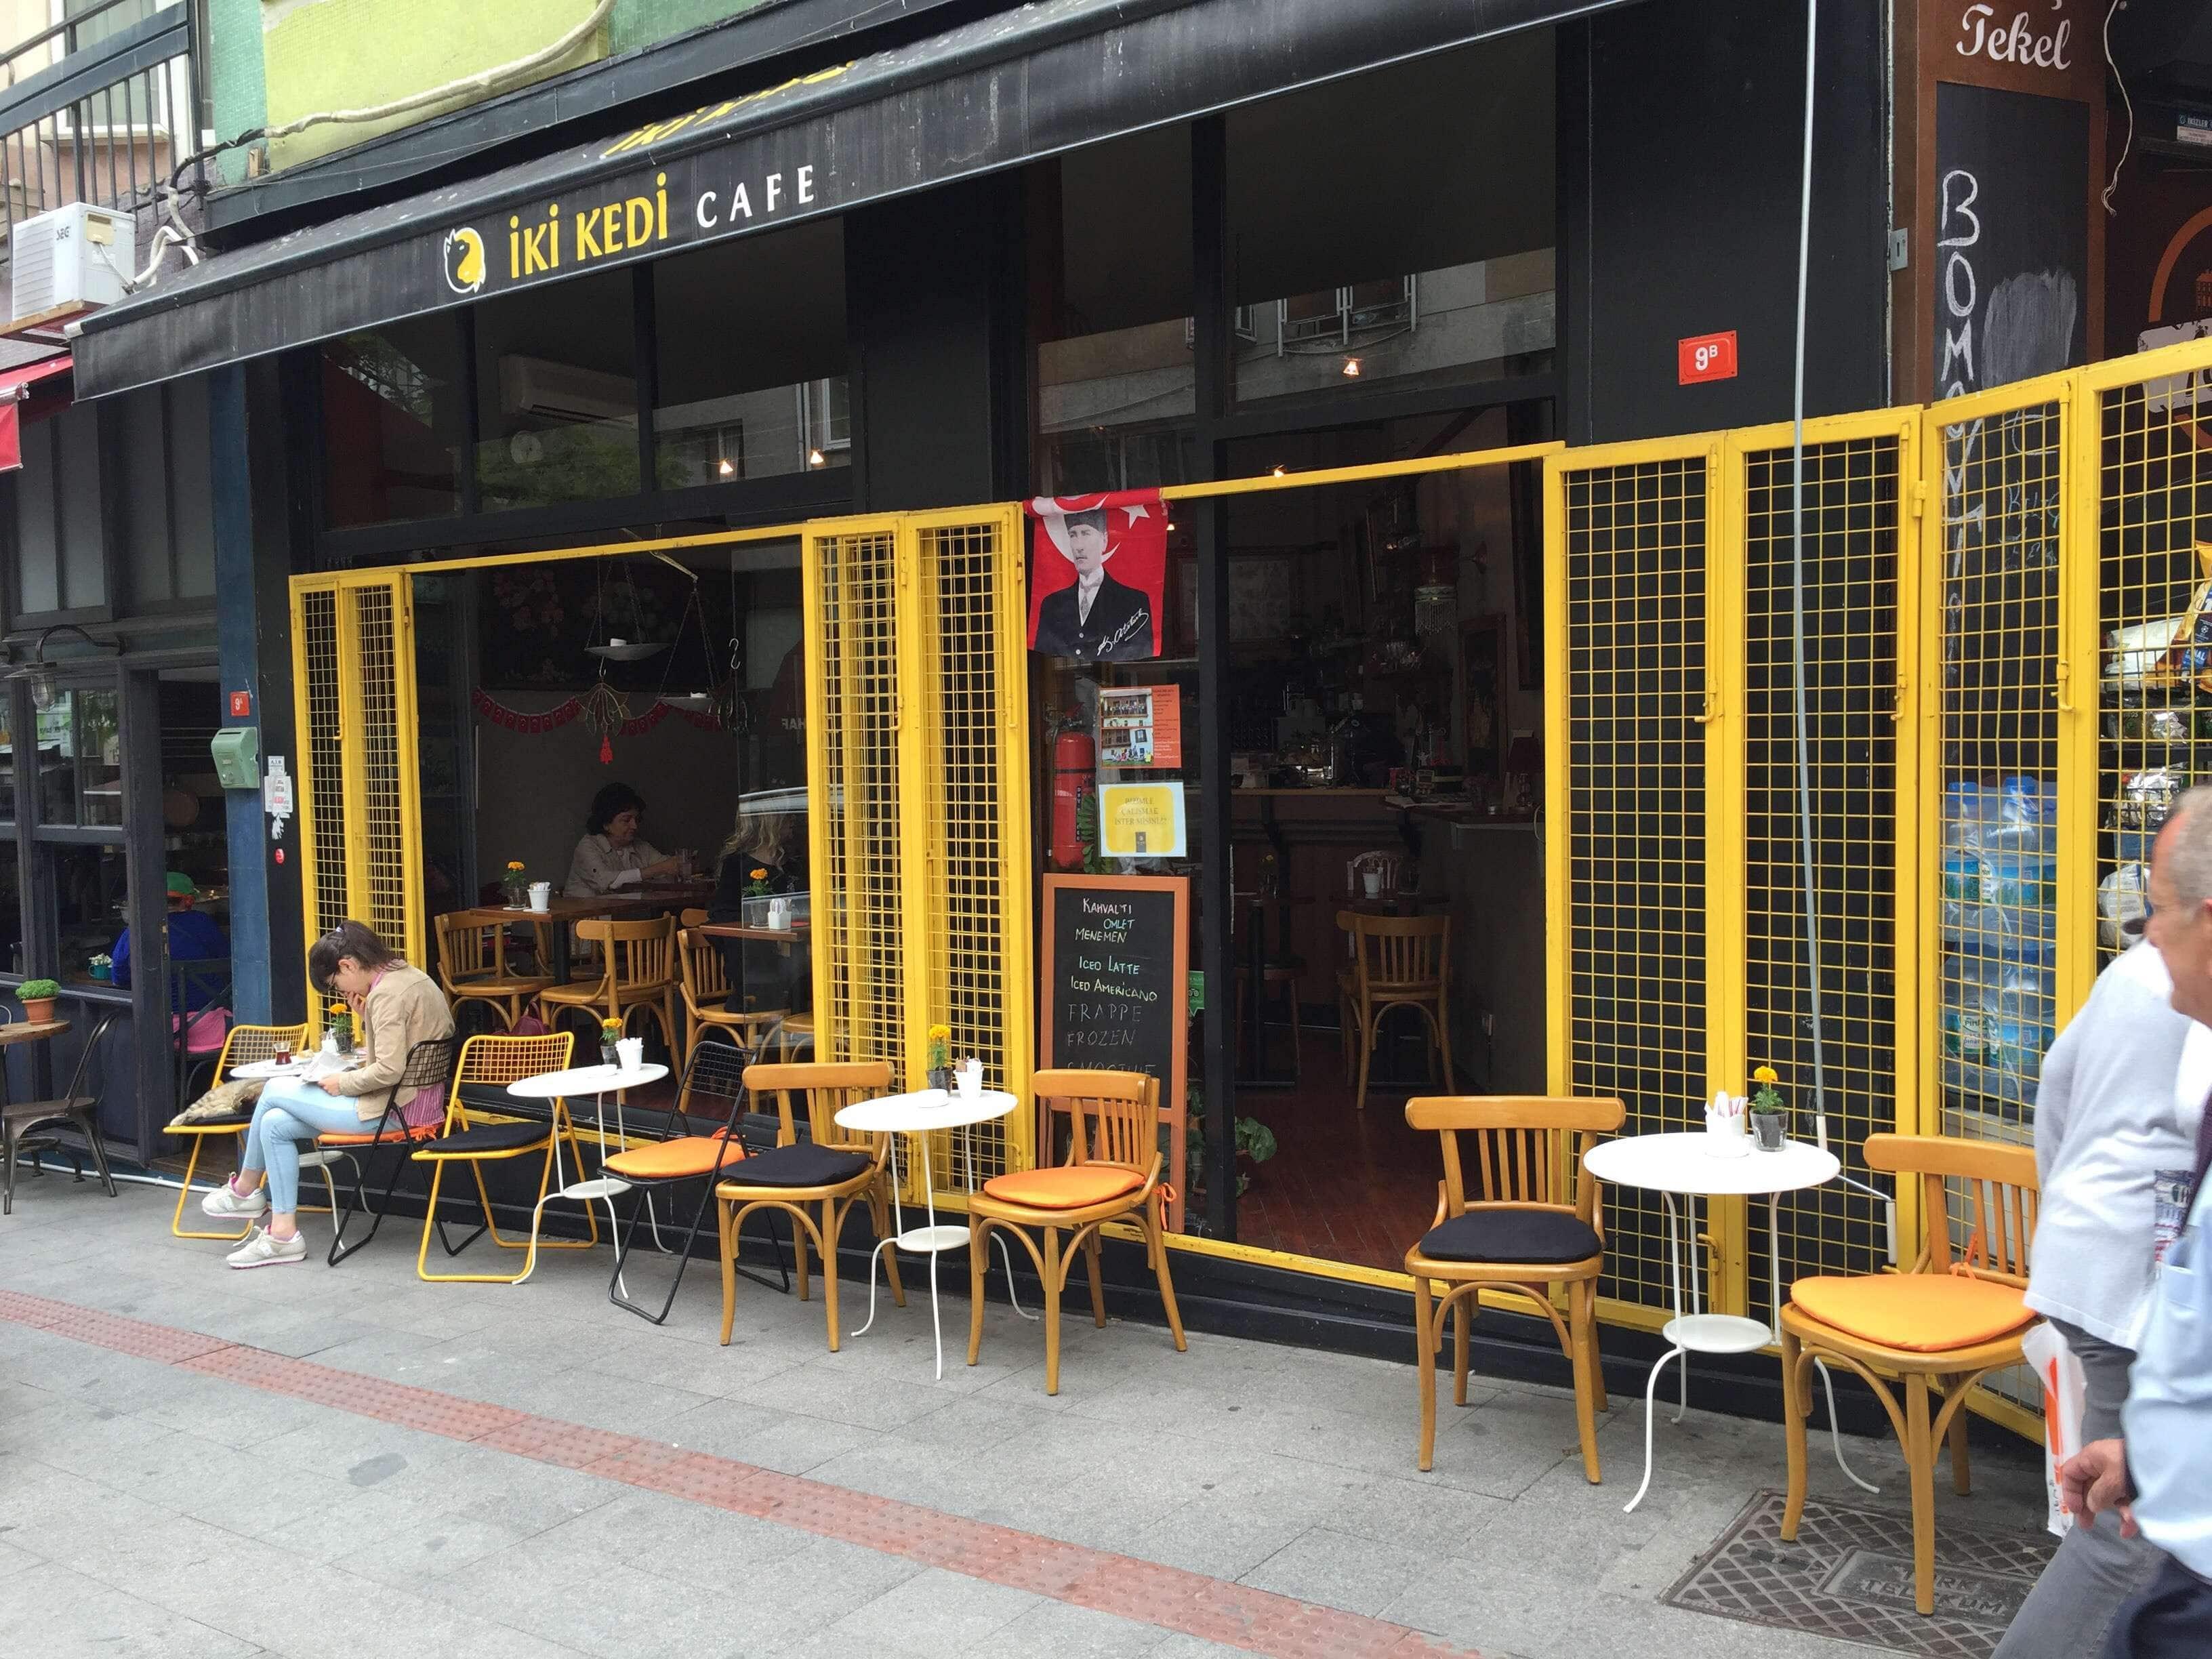 Aylin Kumdagezers Review For Iki Kedi Cafe Moda Istanbul On Zomato